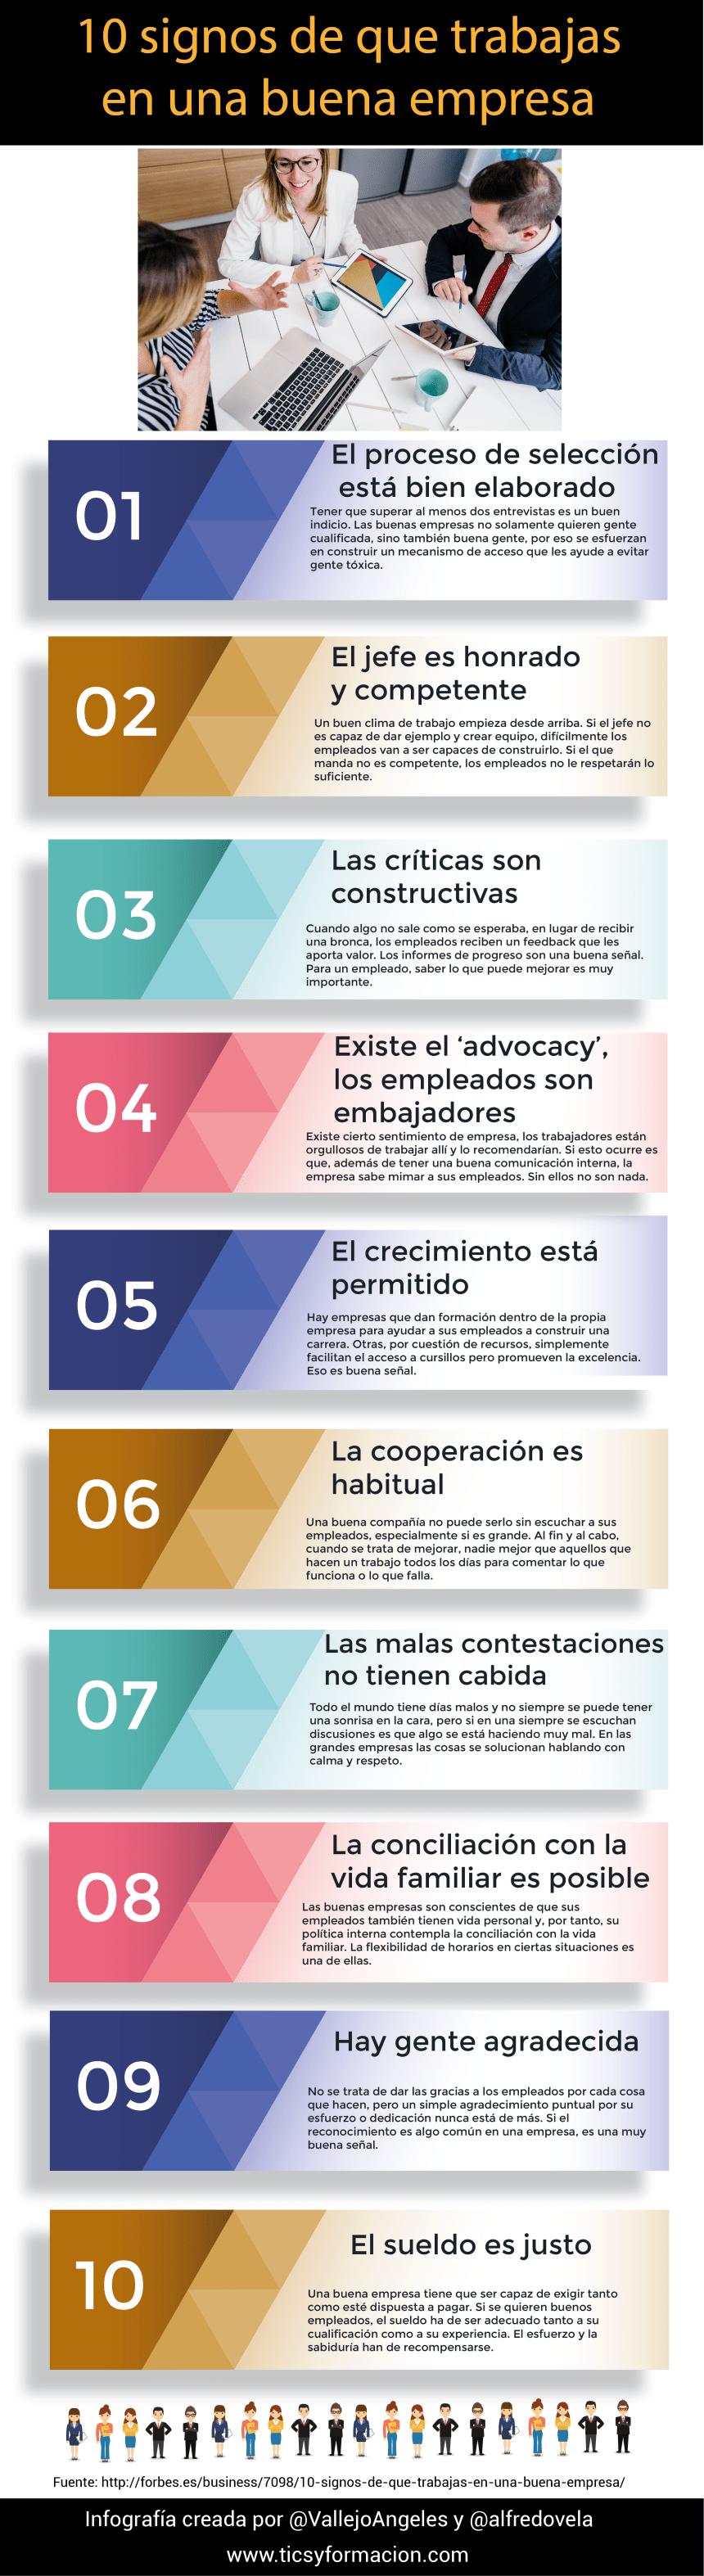 10 signos de que trabajas en una buena empresa #infografia #infographic #rrhh